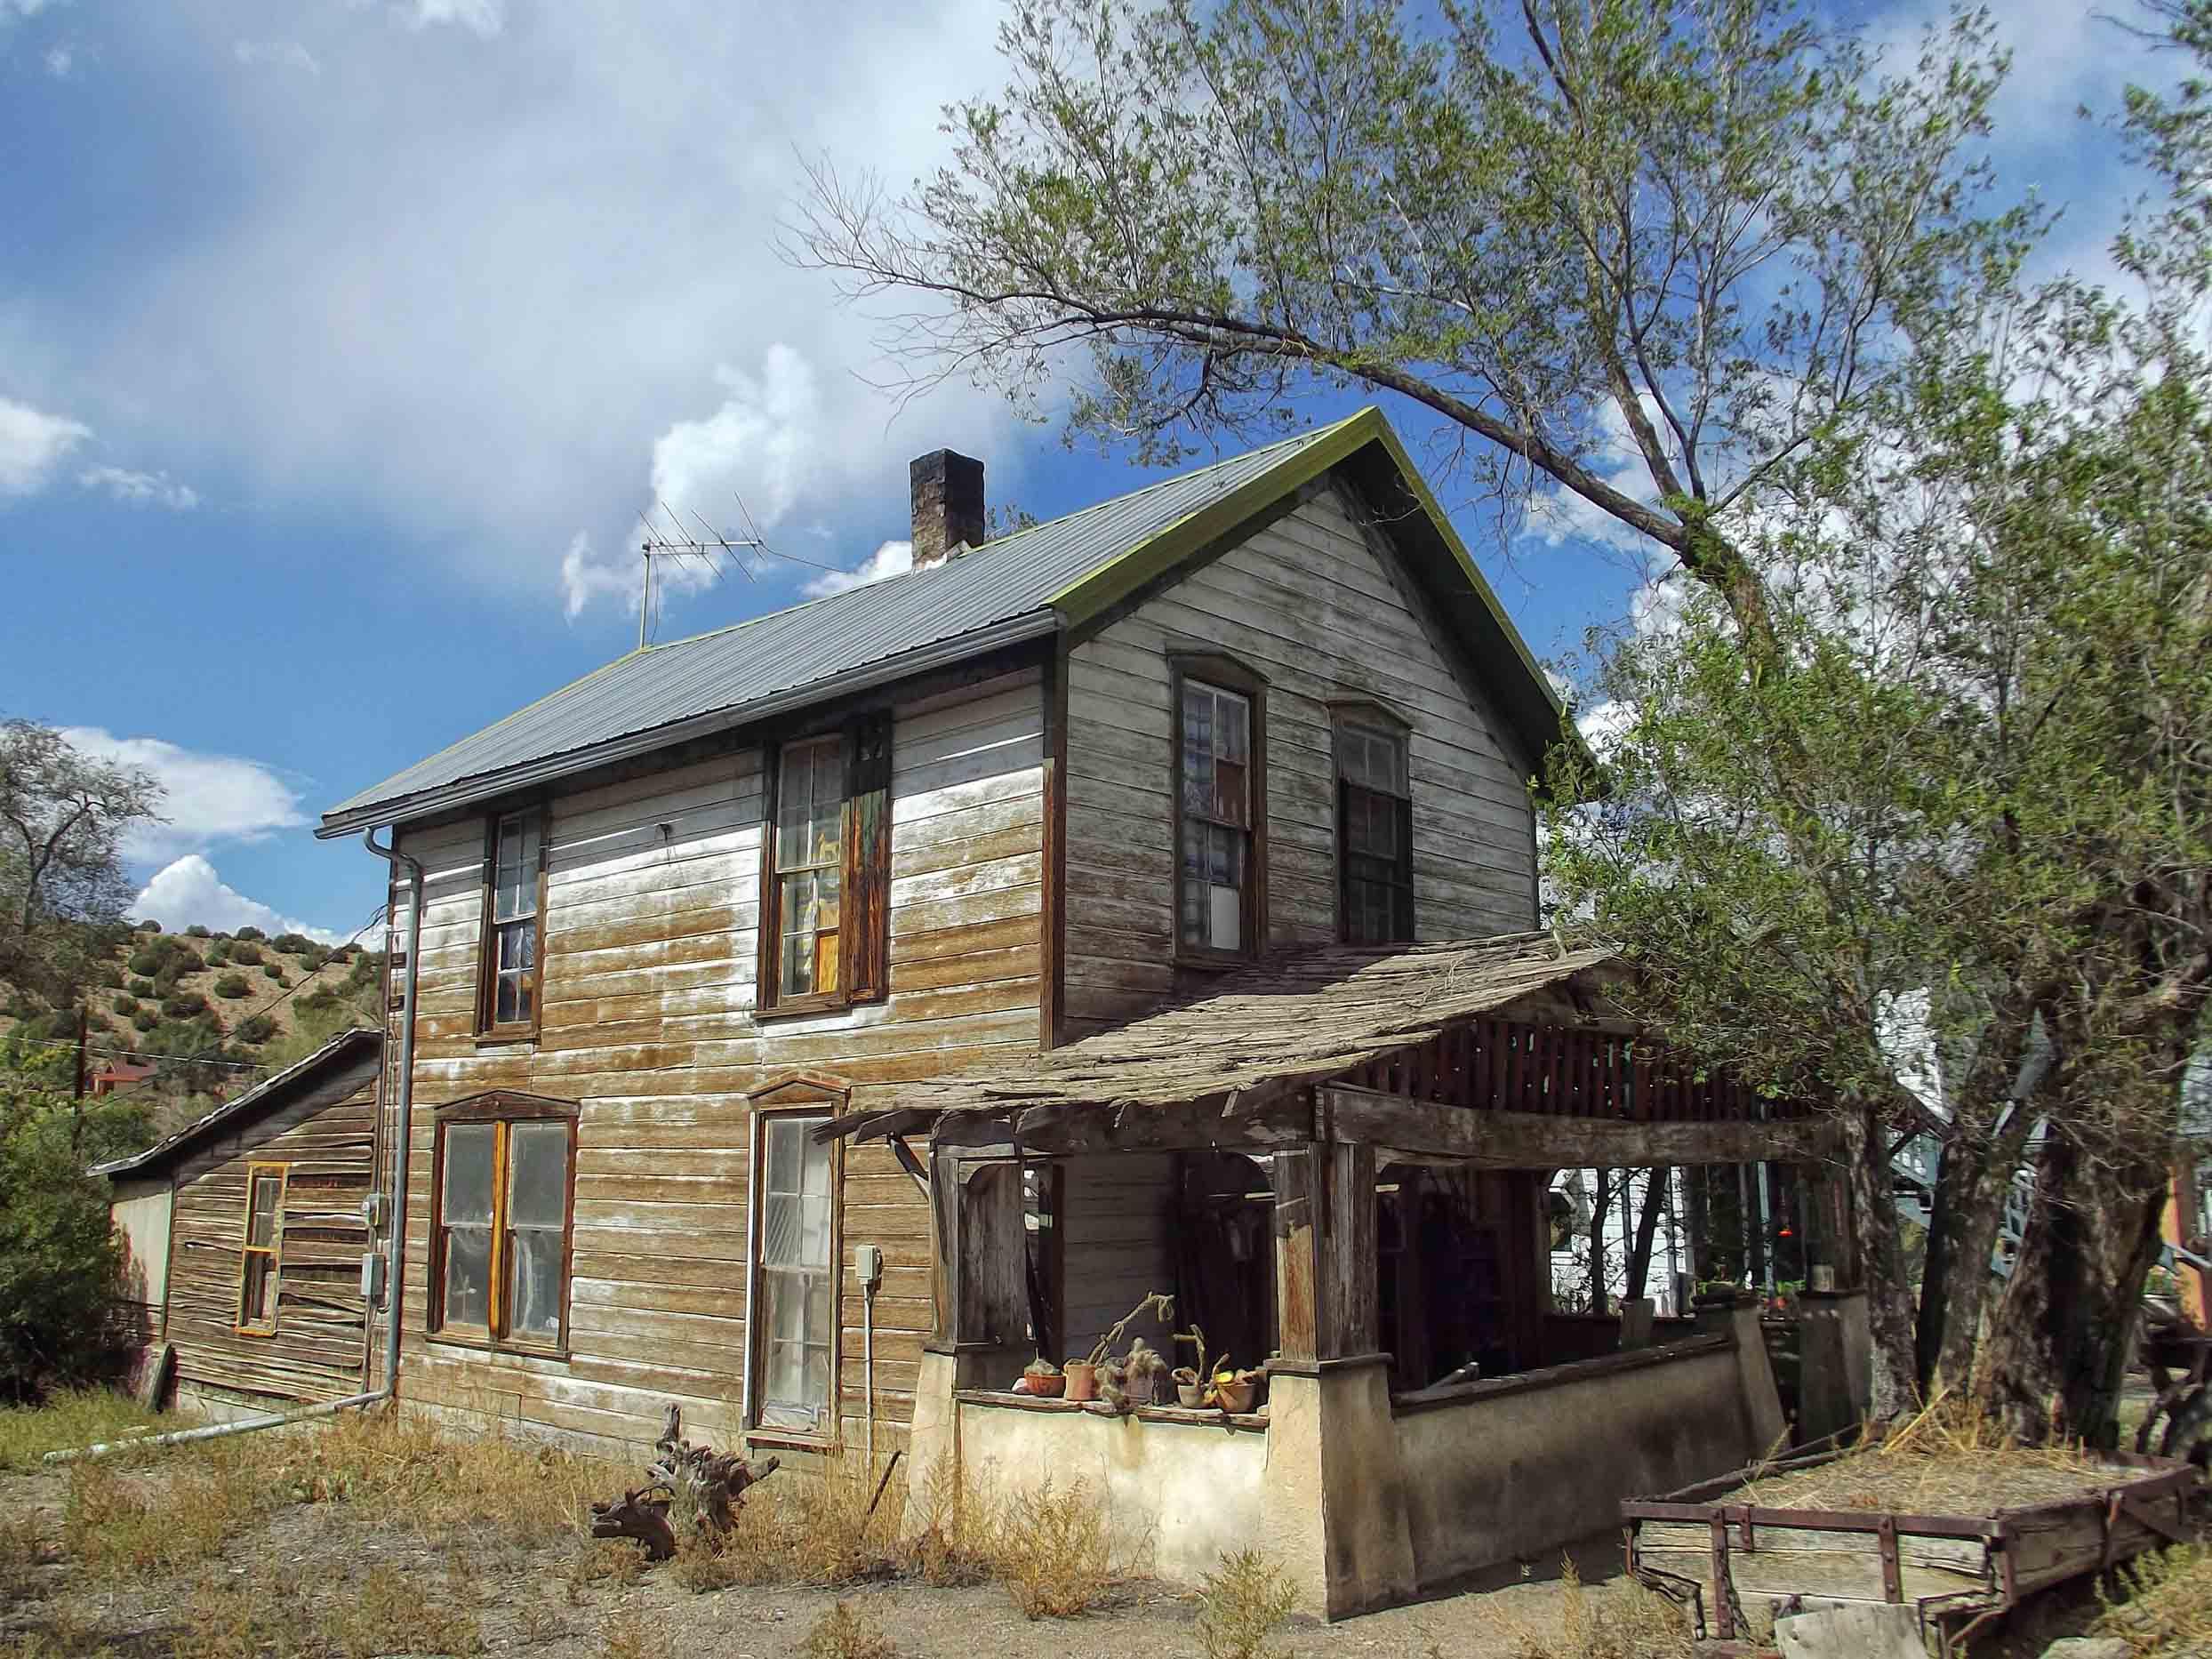 Run-down wooden house